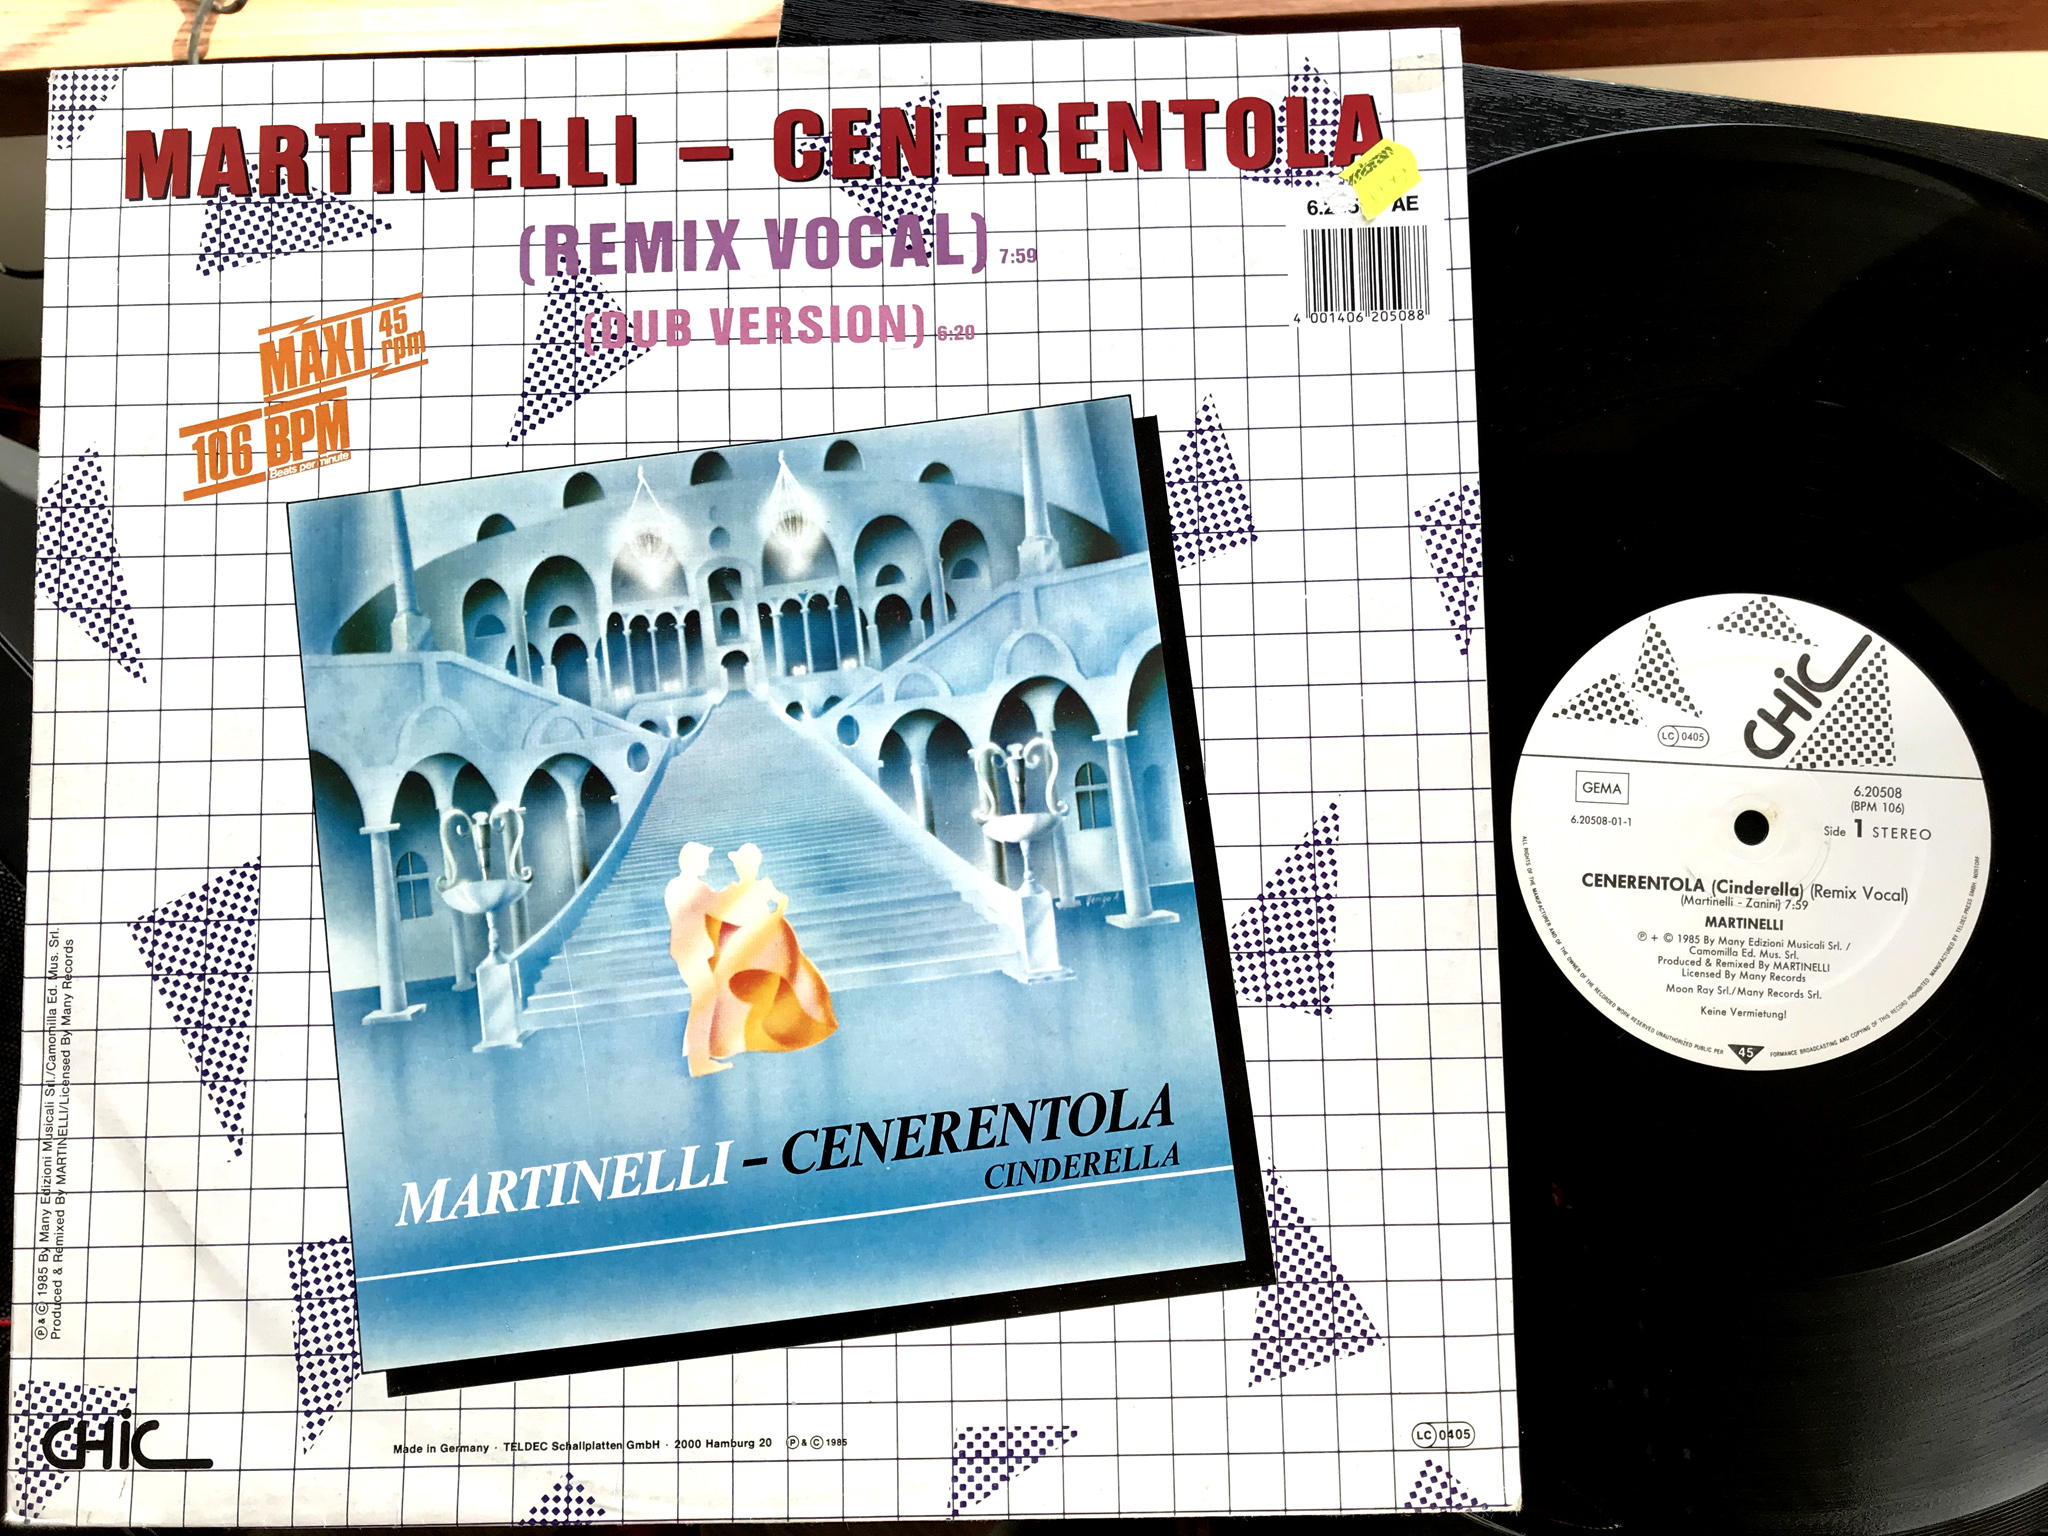 Martinelli - Cenerentola (Cinderella Remix)